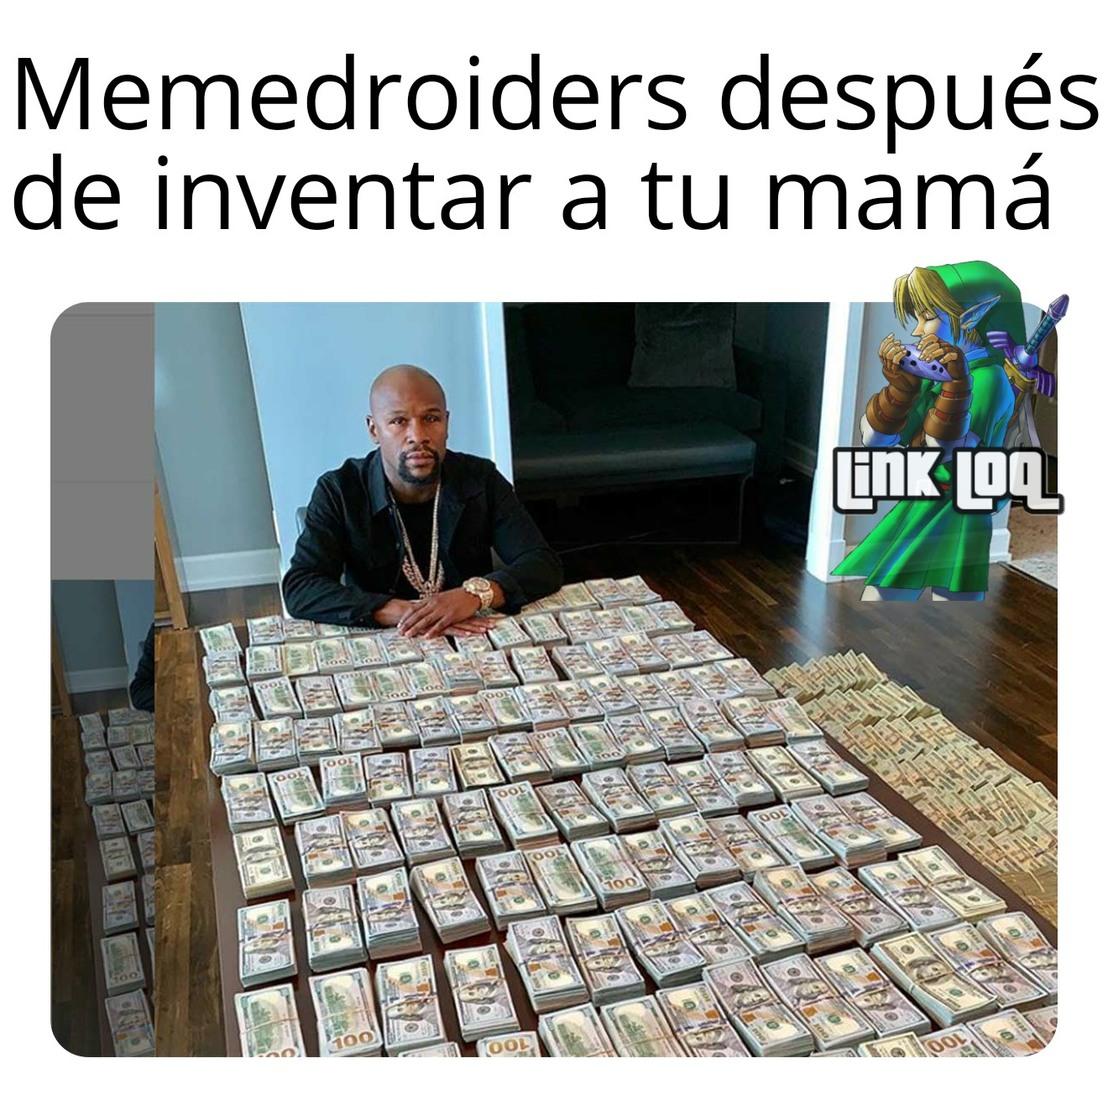 Contexto: los memes de tu mamá